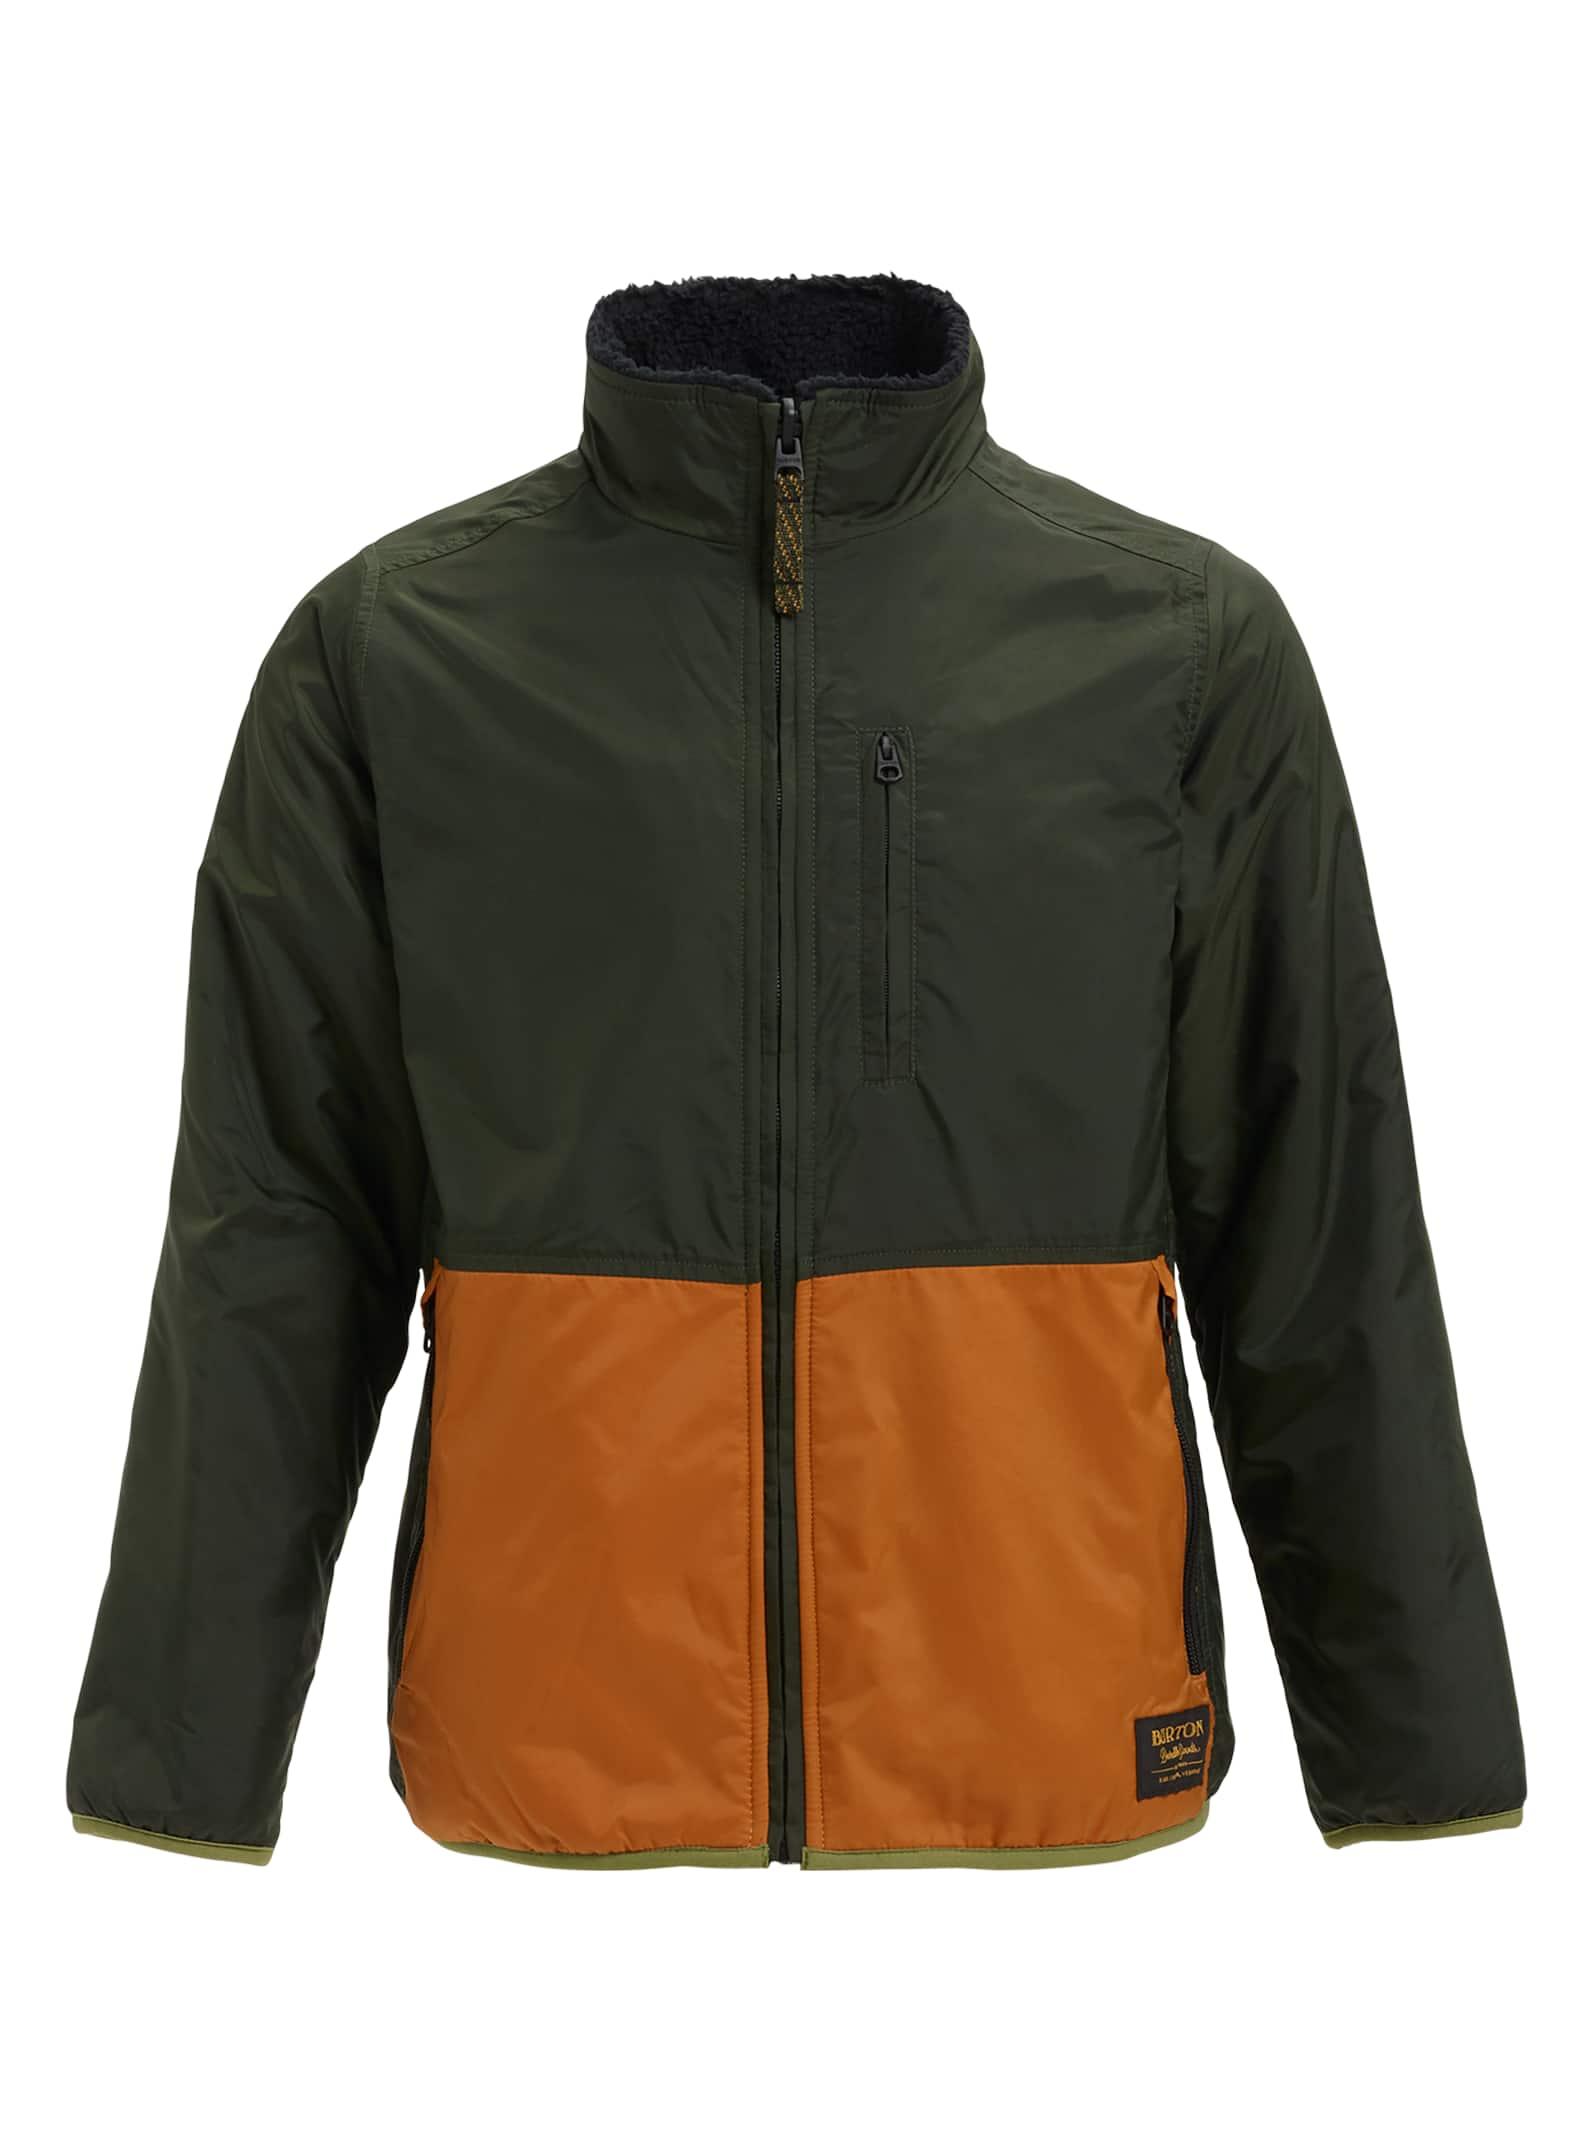 e6ece4dcb45e Kids  Jackets   Outerwear